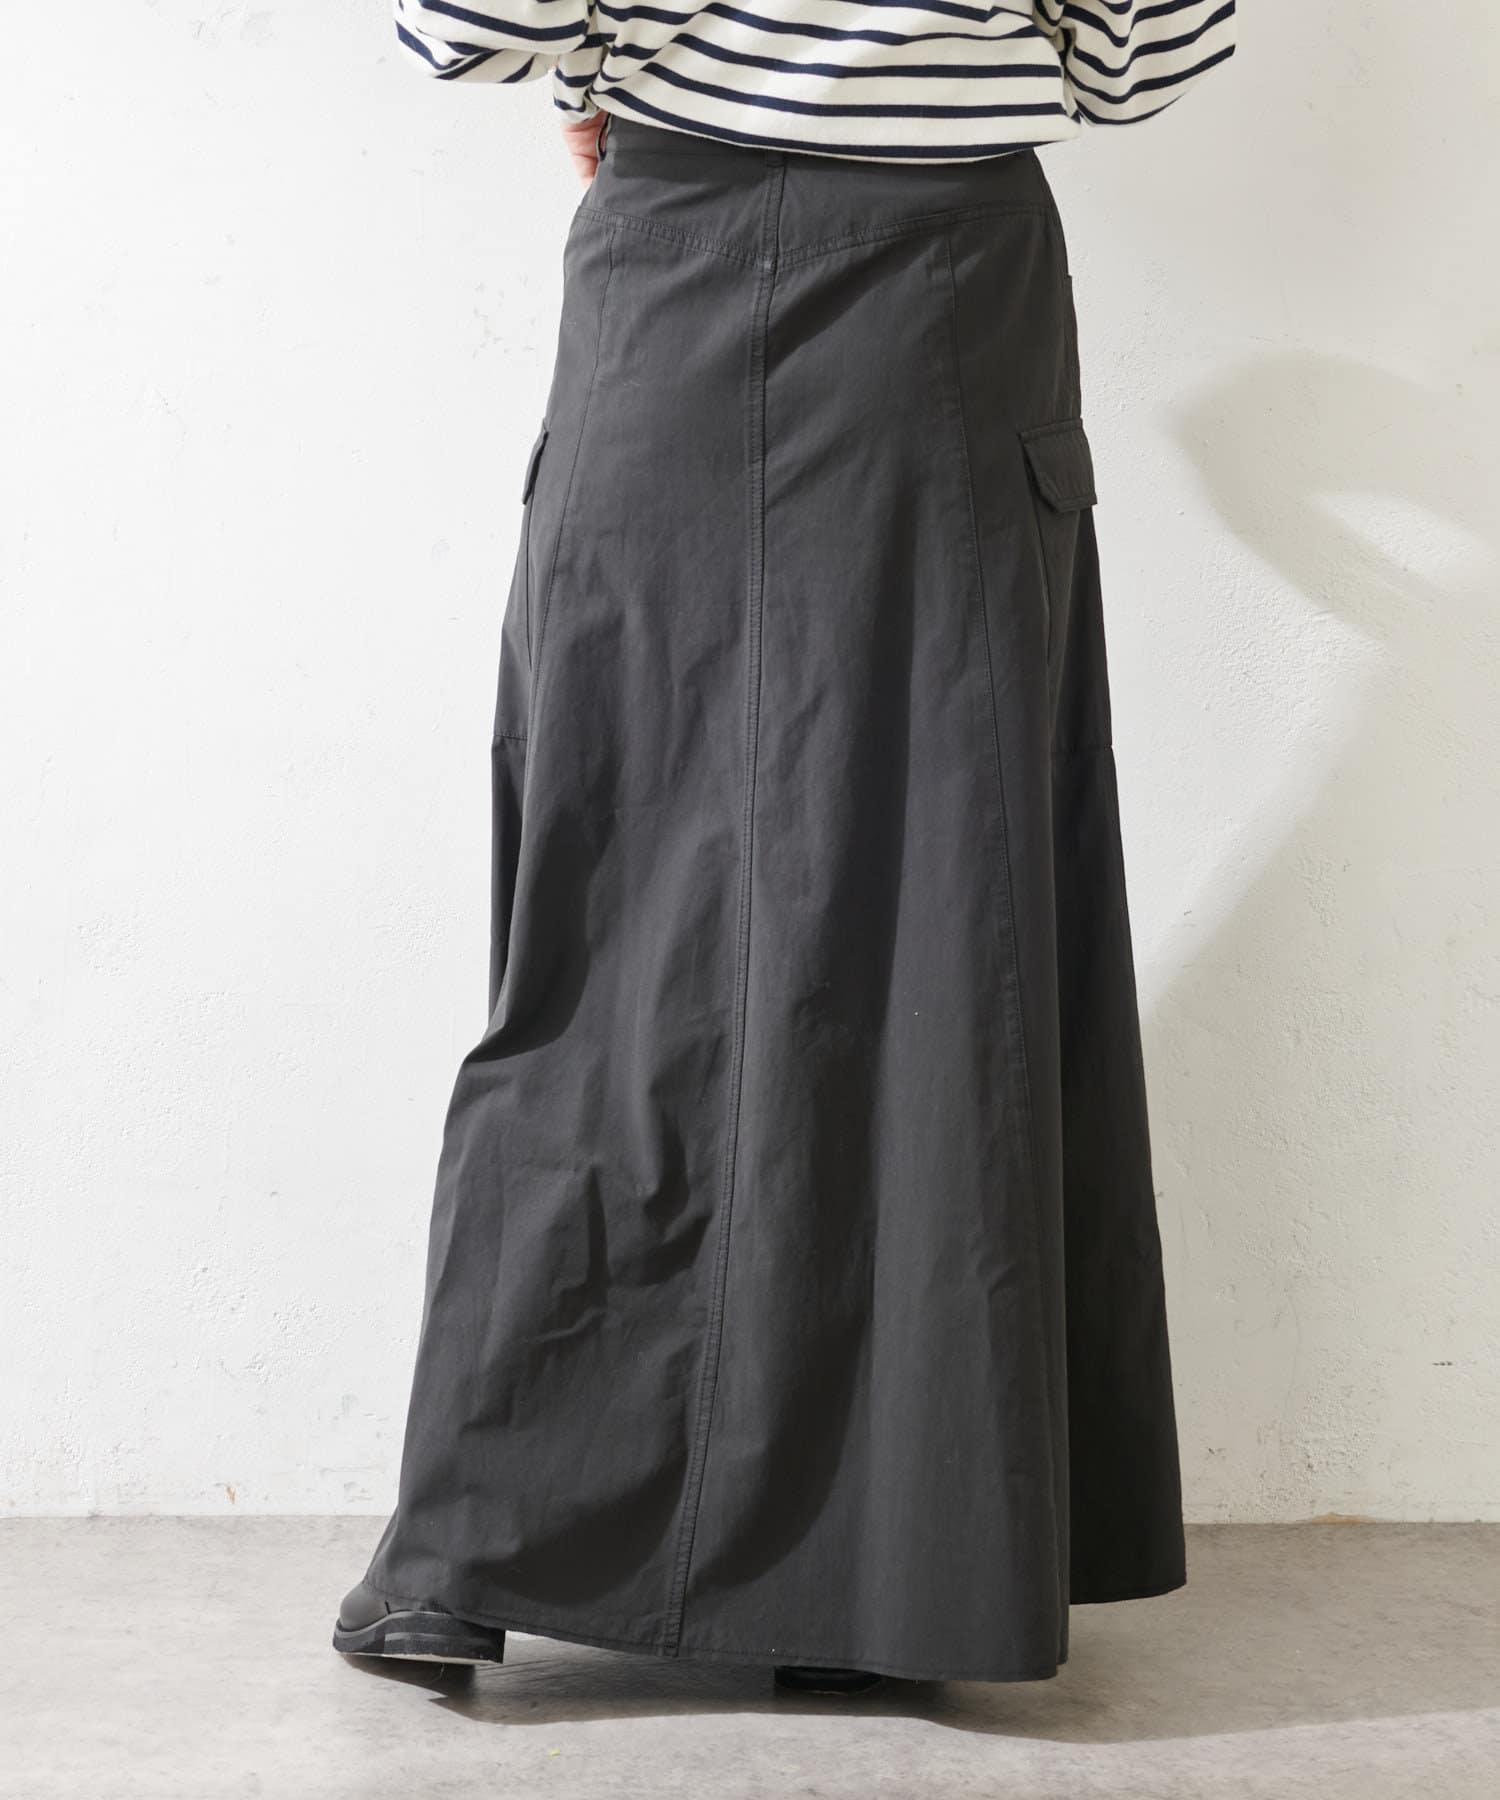 SHENERY(シーナリー) カットオフカーゴロングスカート